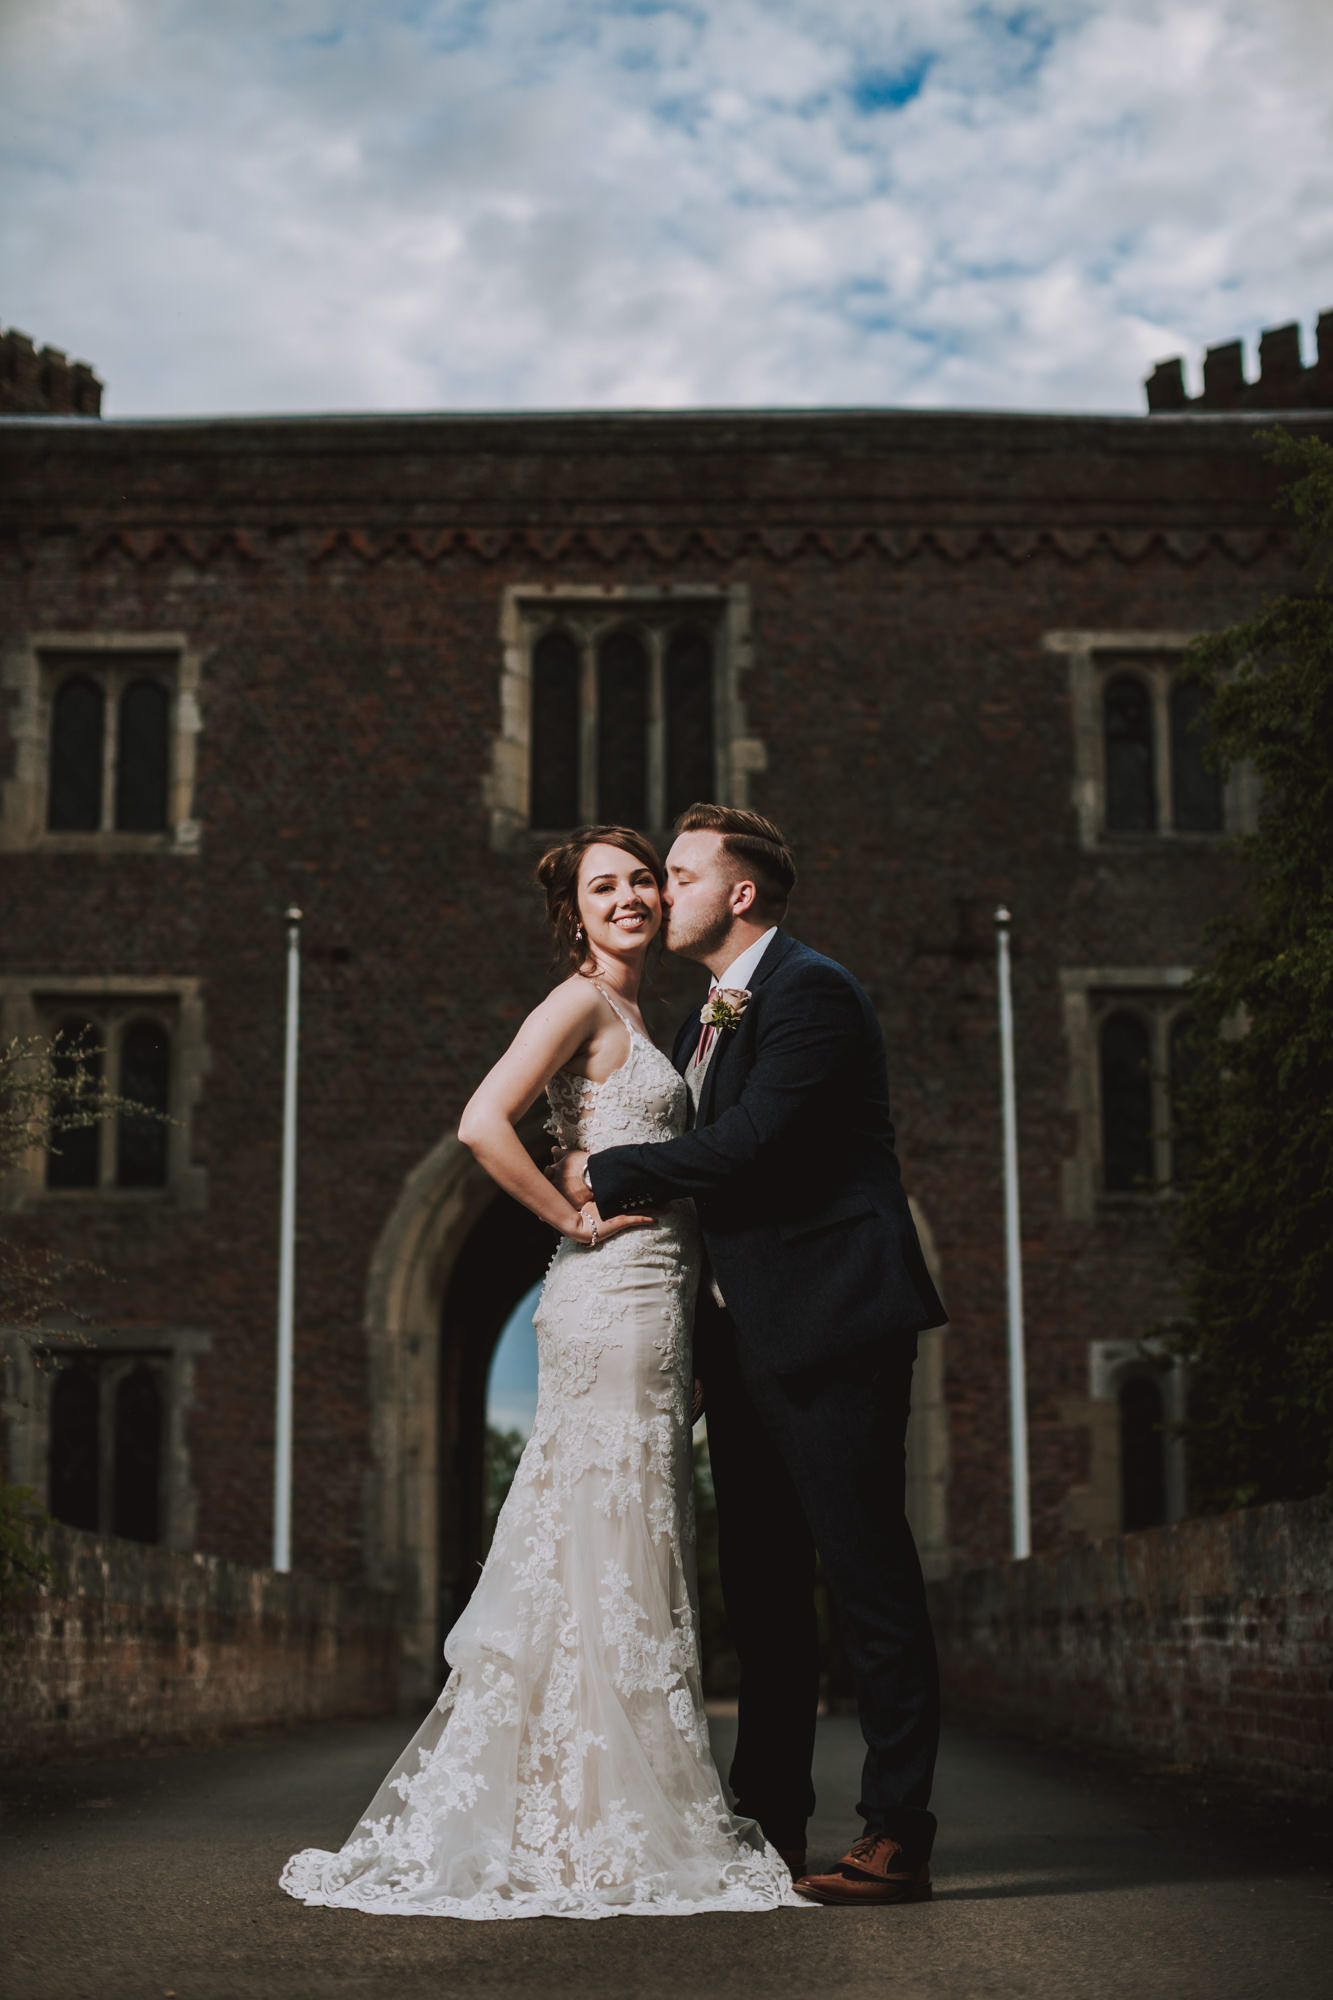 hodsock priory wedding photographers blog90.jpg